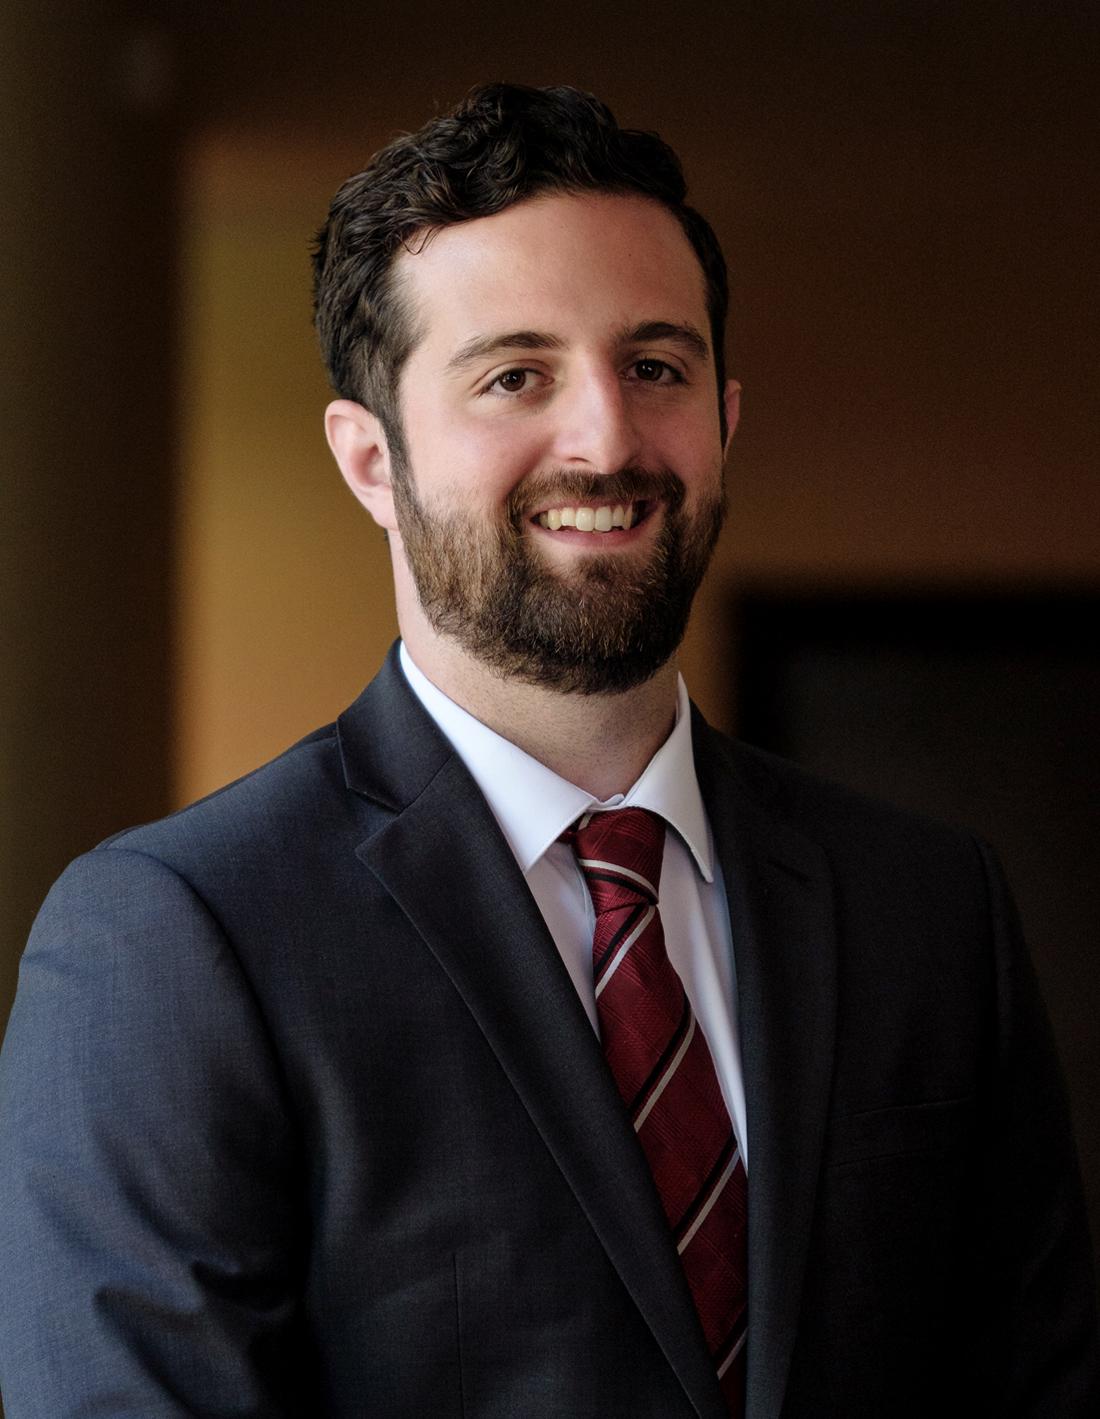 Zachary J. McGee, Associate